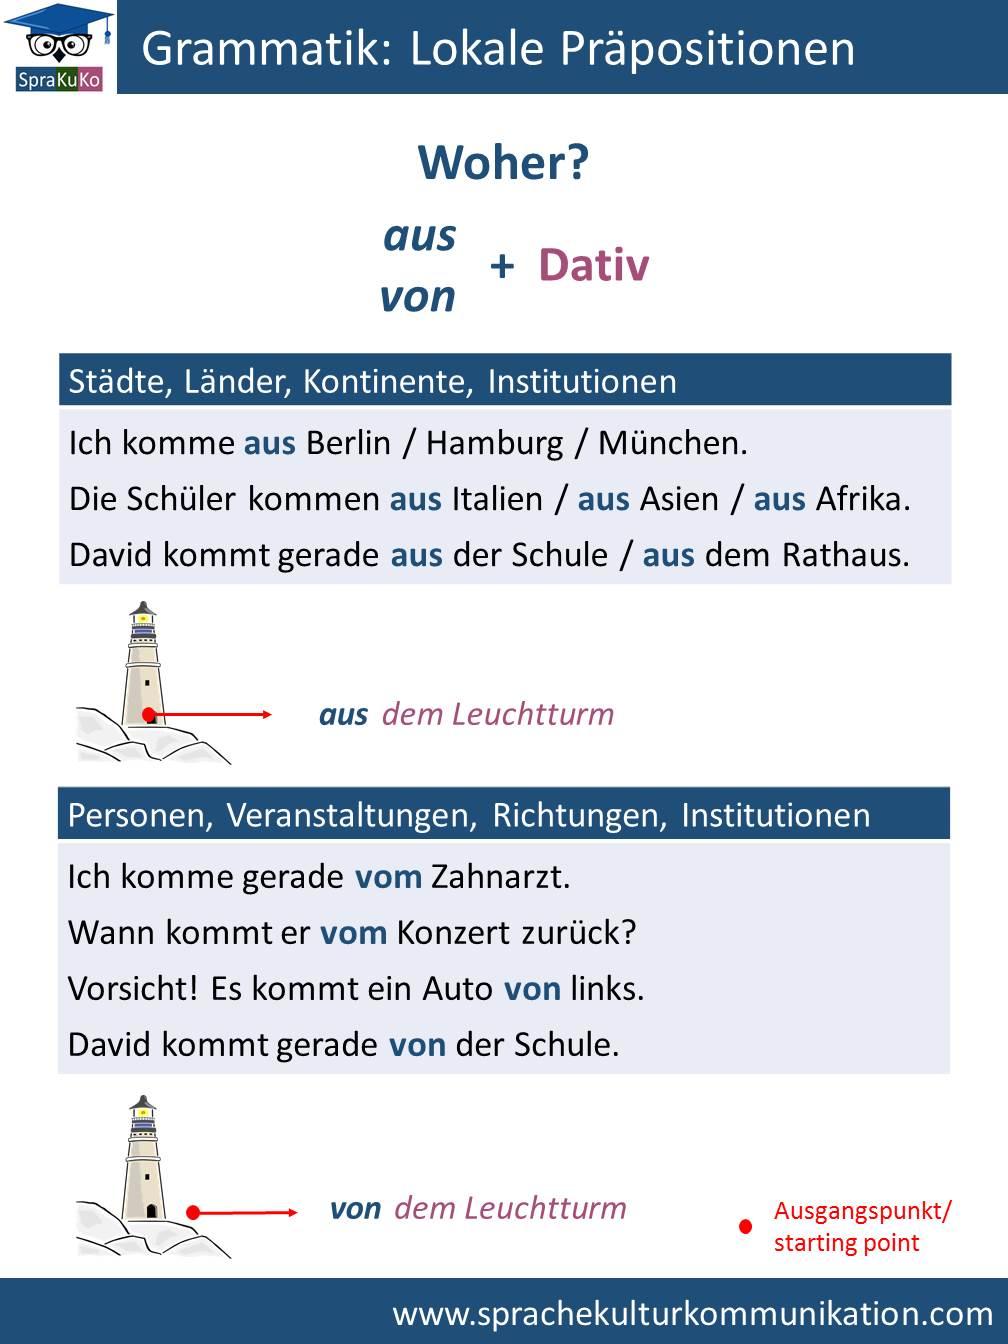 Grammatik Lokale Präpositionen (Woher).jpg